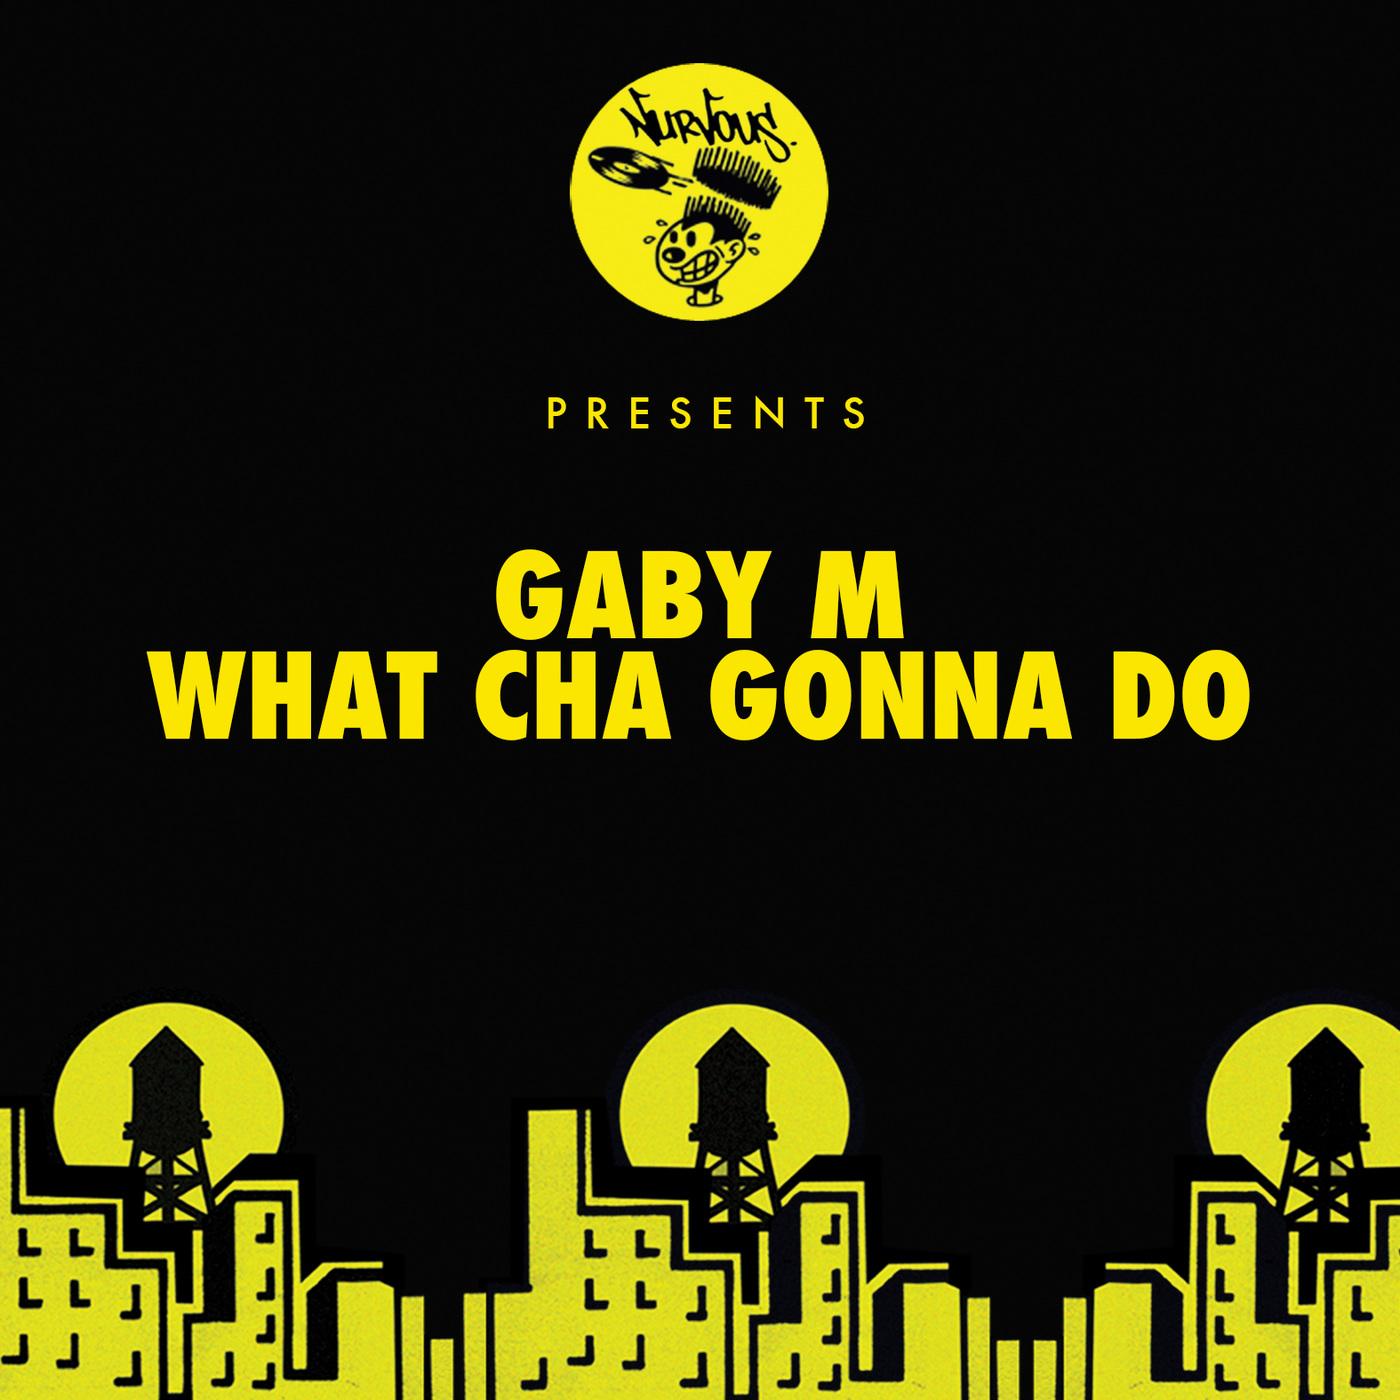 Gaby M - What Cha Gonna Do (Original Mix)